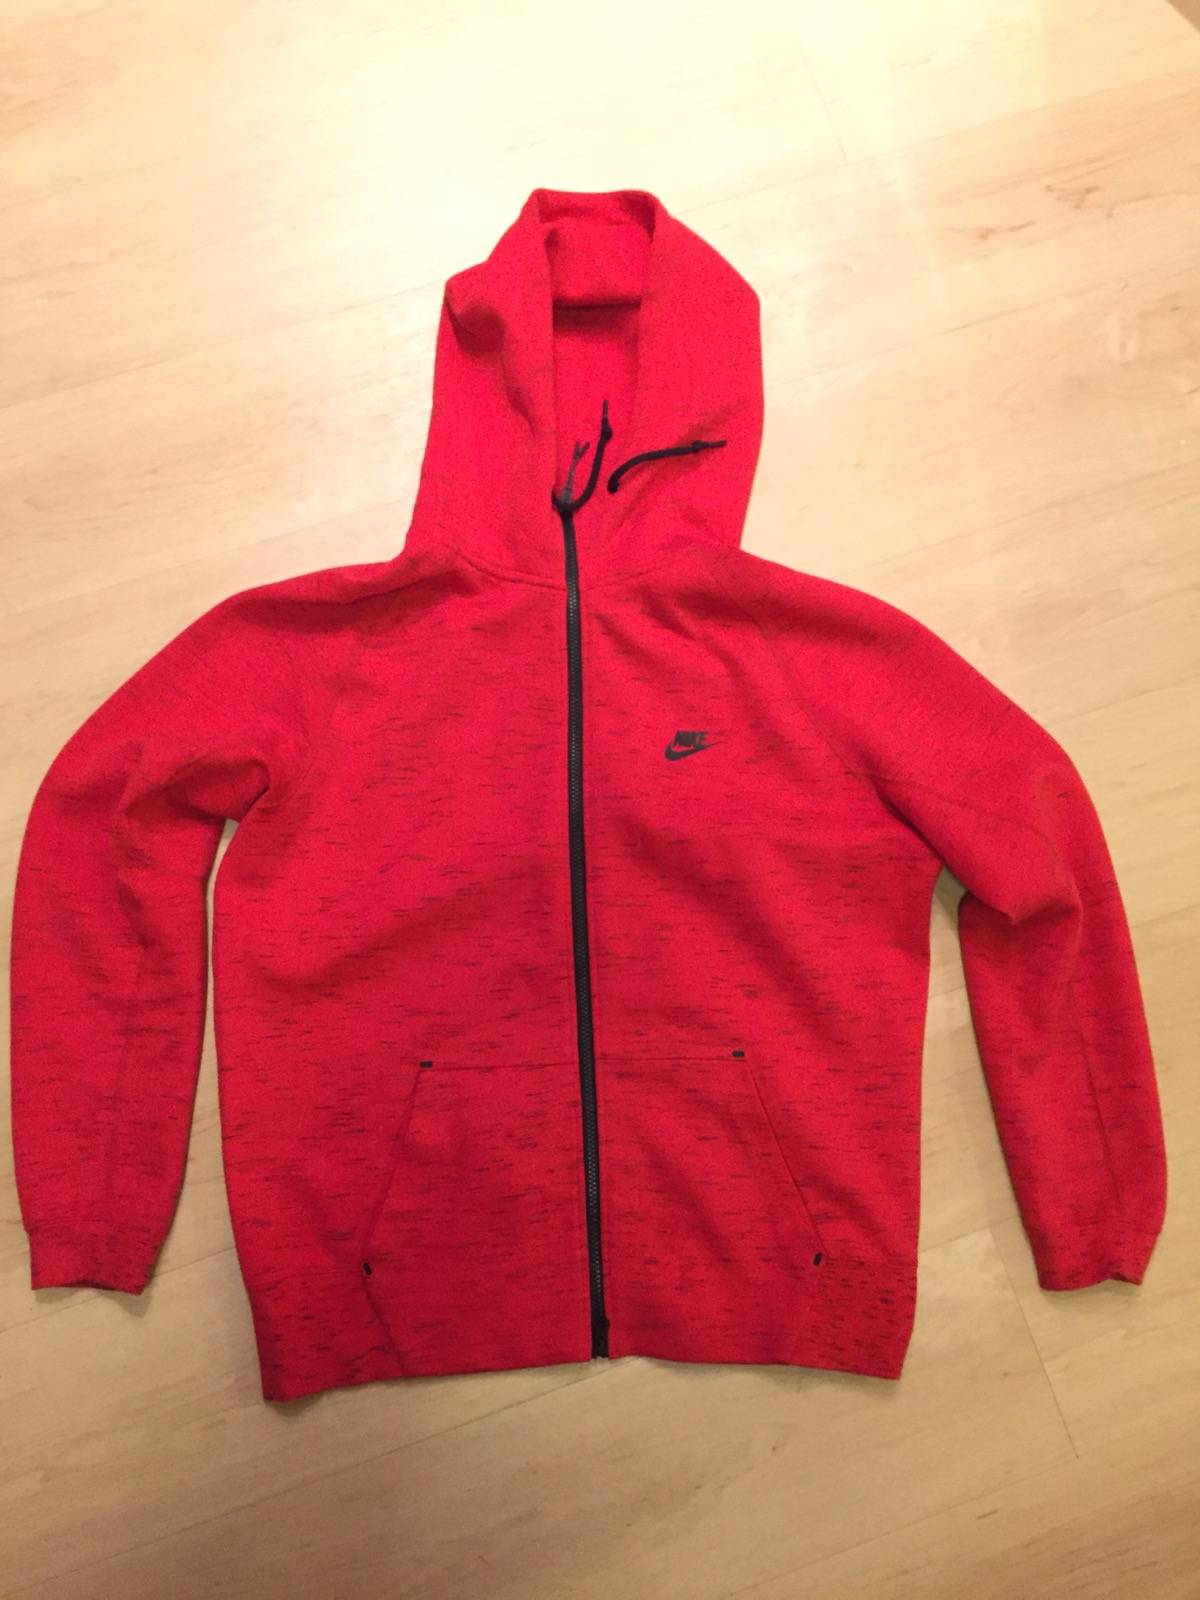 Nike Nike Tech Fleece Hoodie Red Size Large Grailed